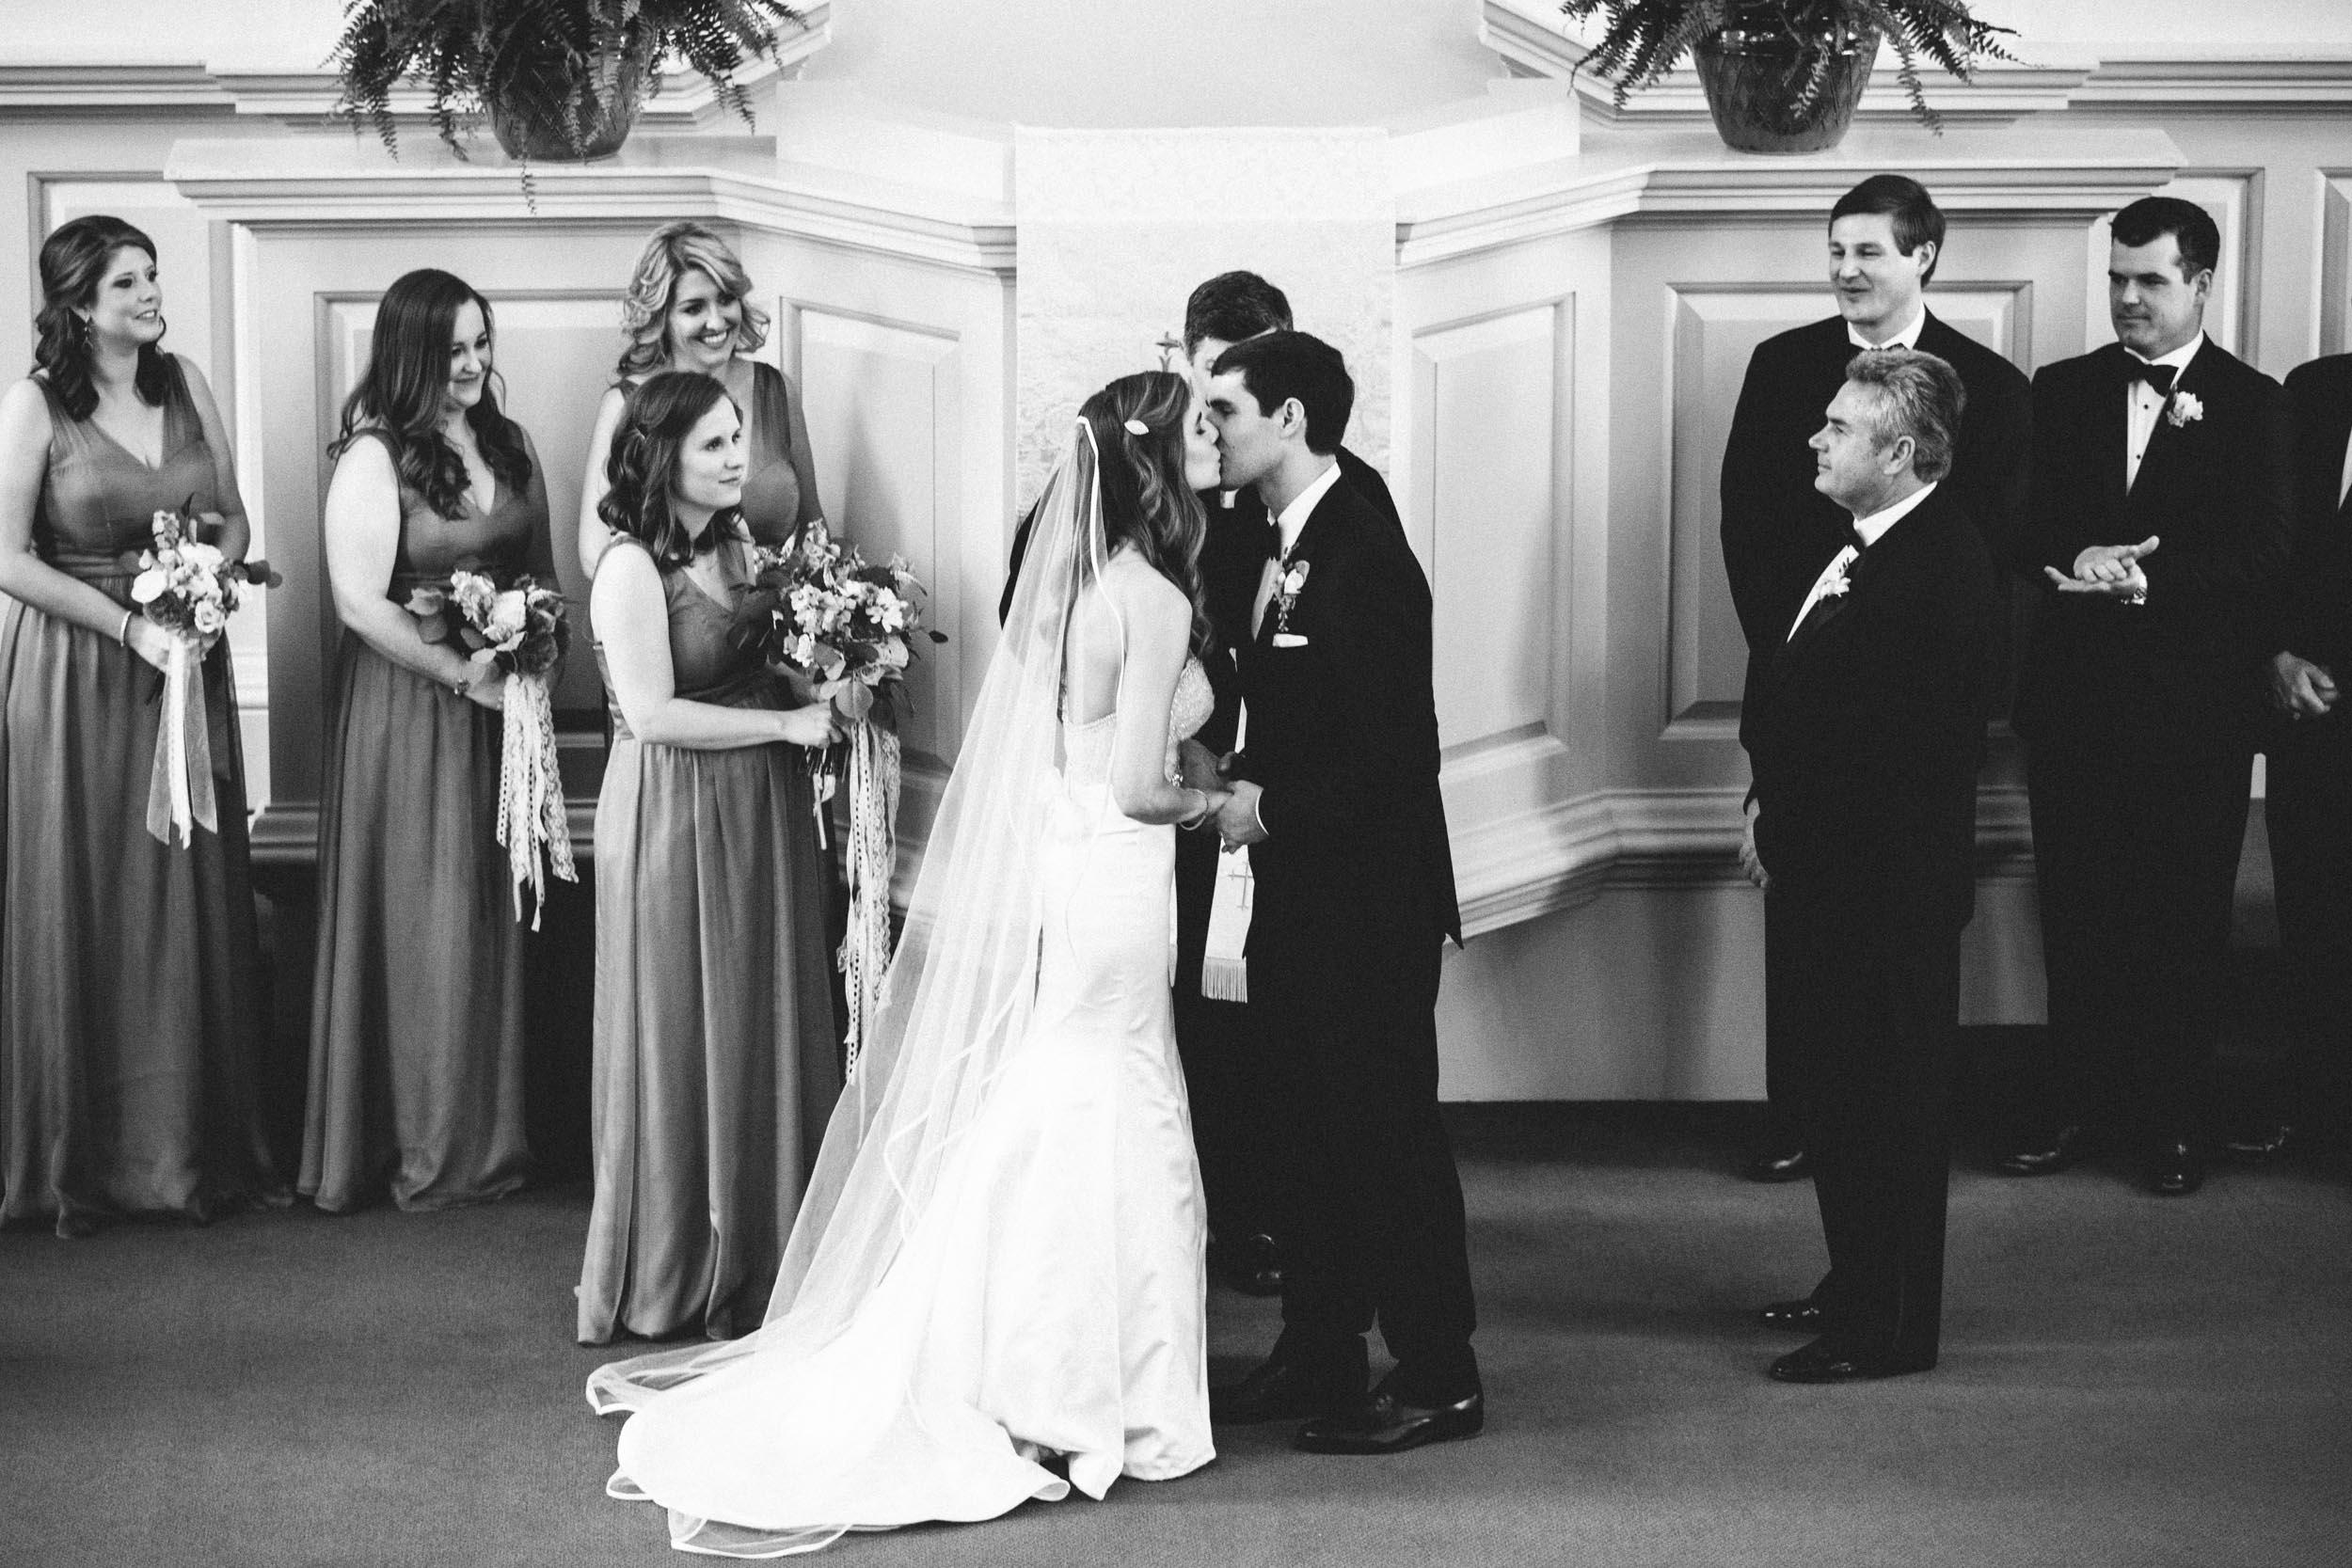 jimmy-rowalt-atlanta-wedding-photography-078.jpg